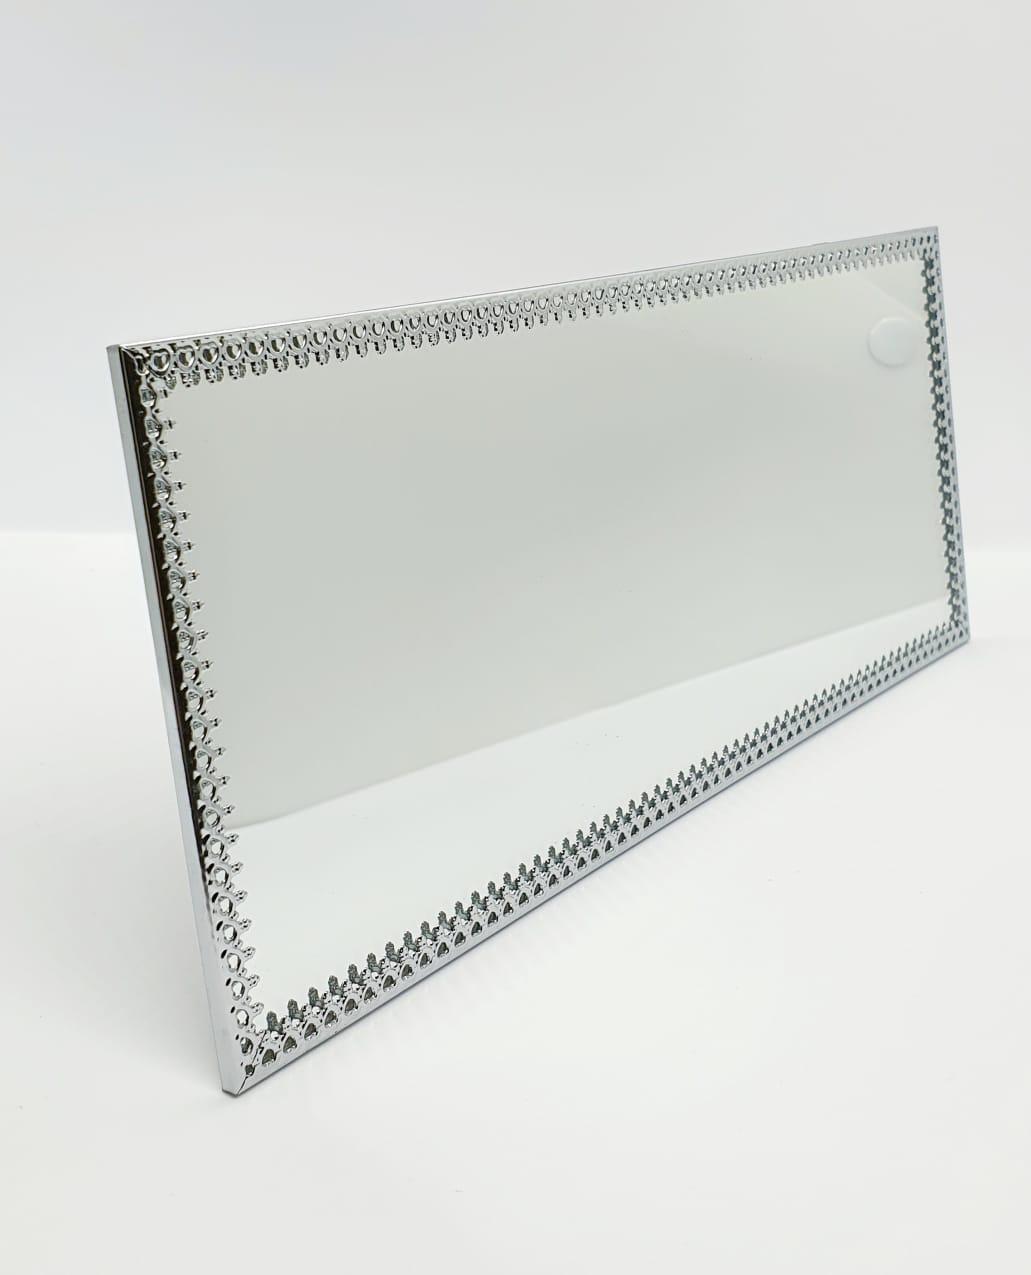 Bandeja espelhada retangular prata